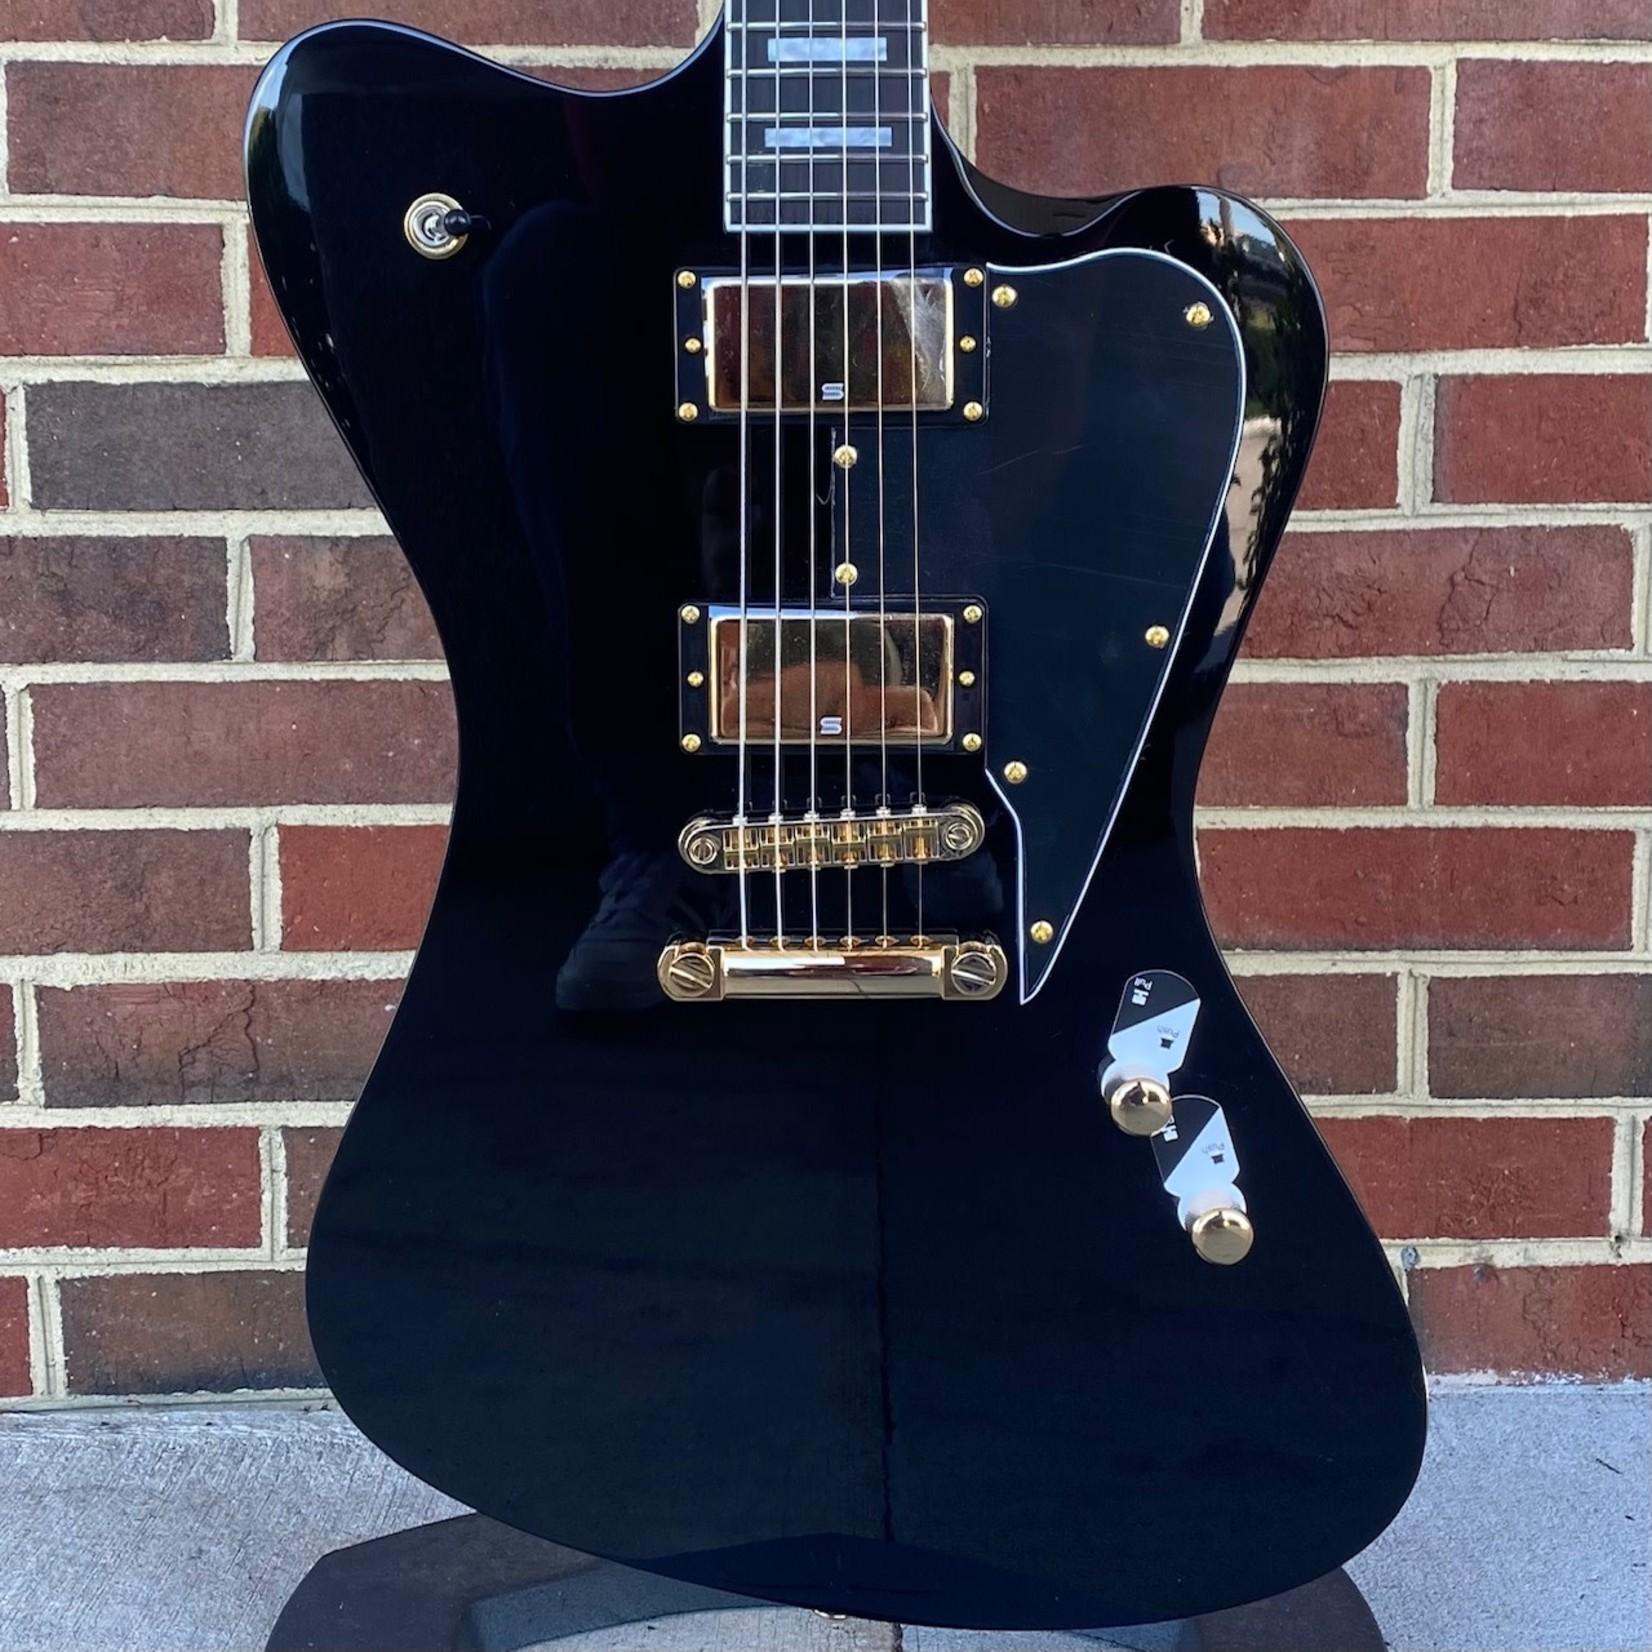 LTD ESP LTD Sparrowhawk, Bill Kelliher Signature Model, Black, Gold Hardware, Seymour Duncan Distortion, Hardshell Case